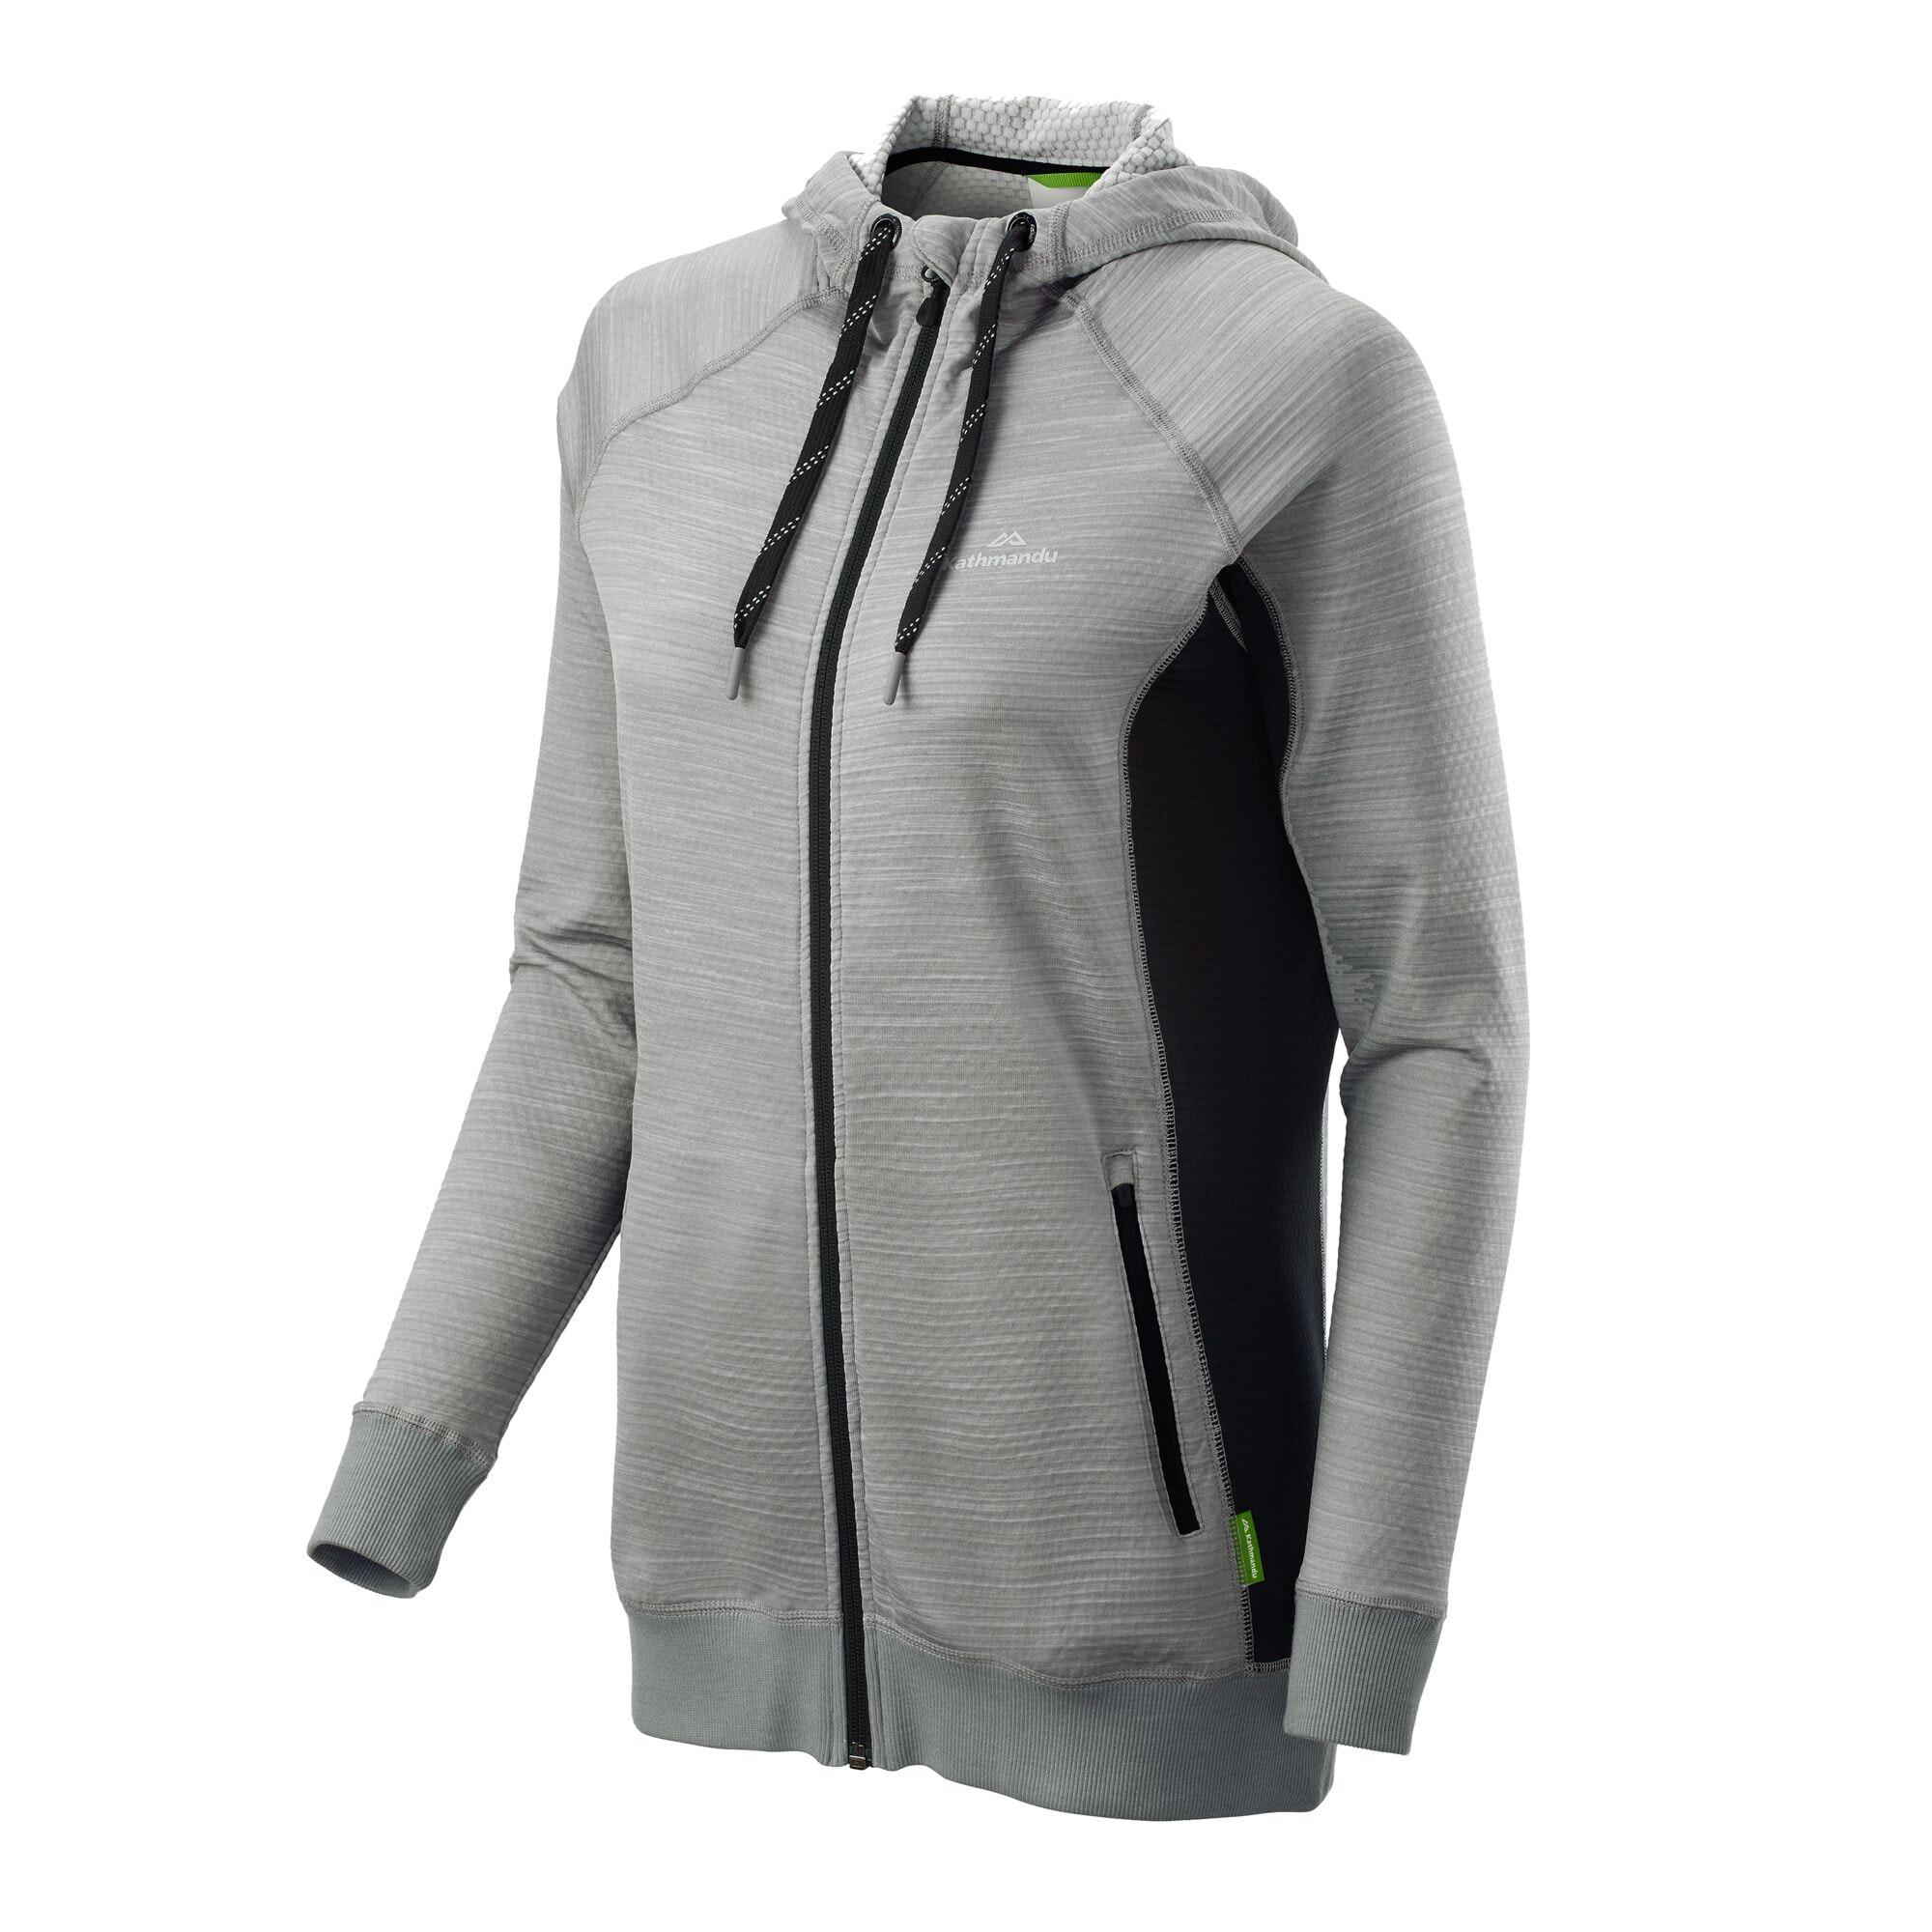 NEW-Kathmandu-Acota-Women-s-Hooded-Fleece-Lightweight-Breathable-Outdoor-Jacket thumbnail 27